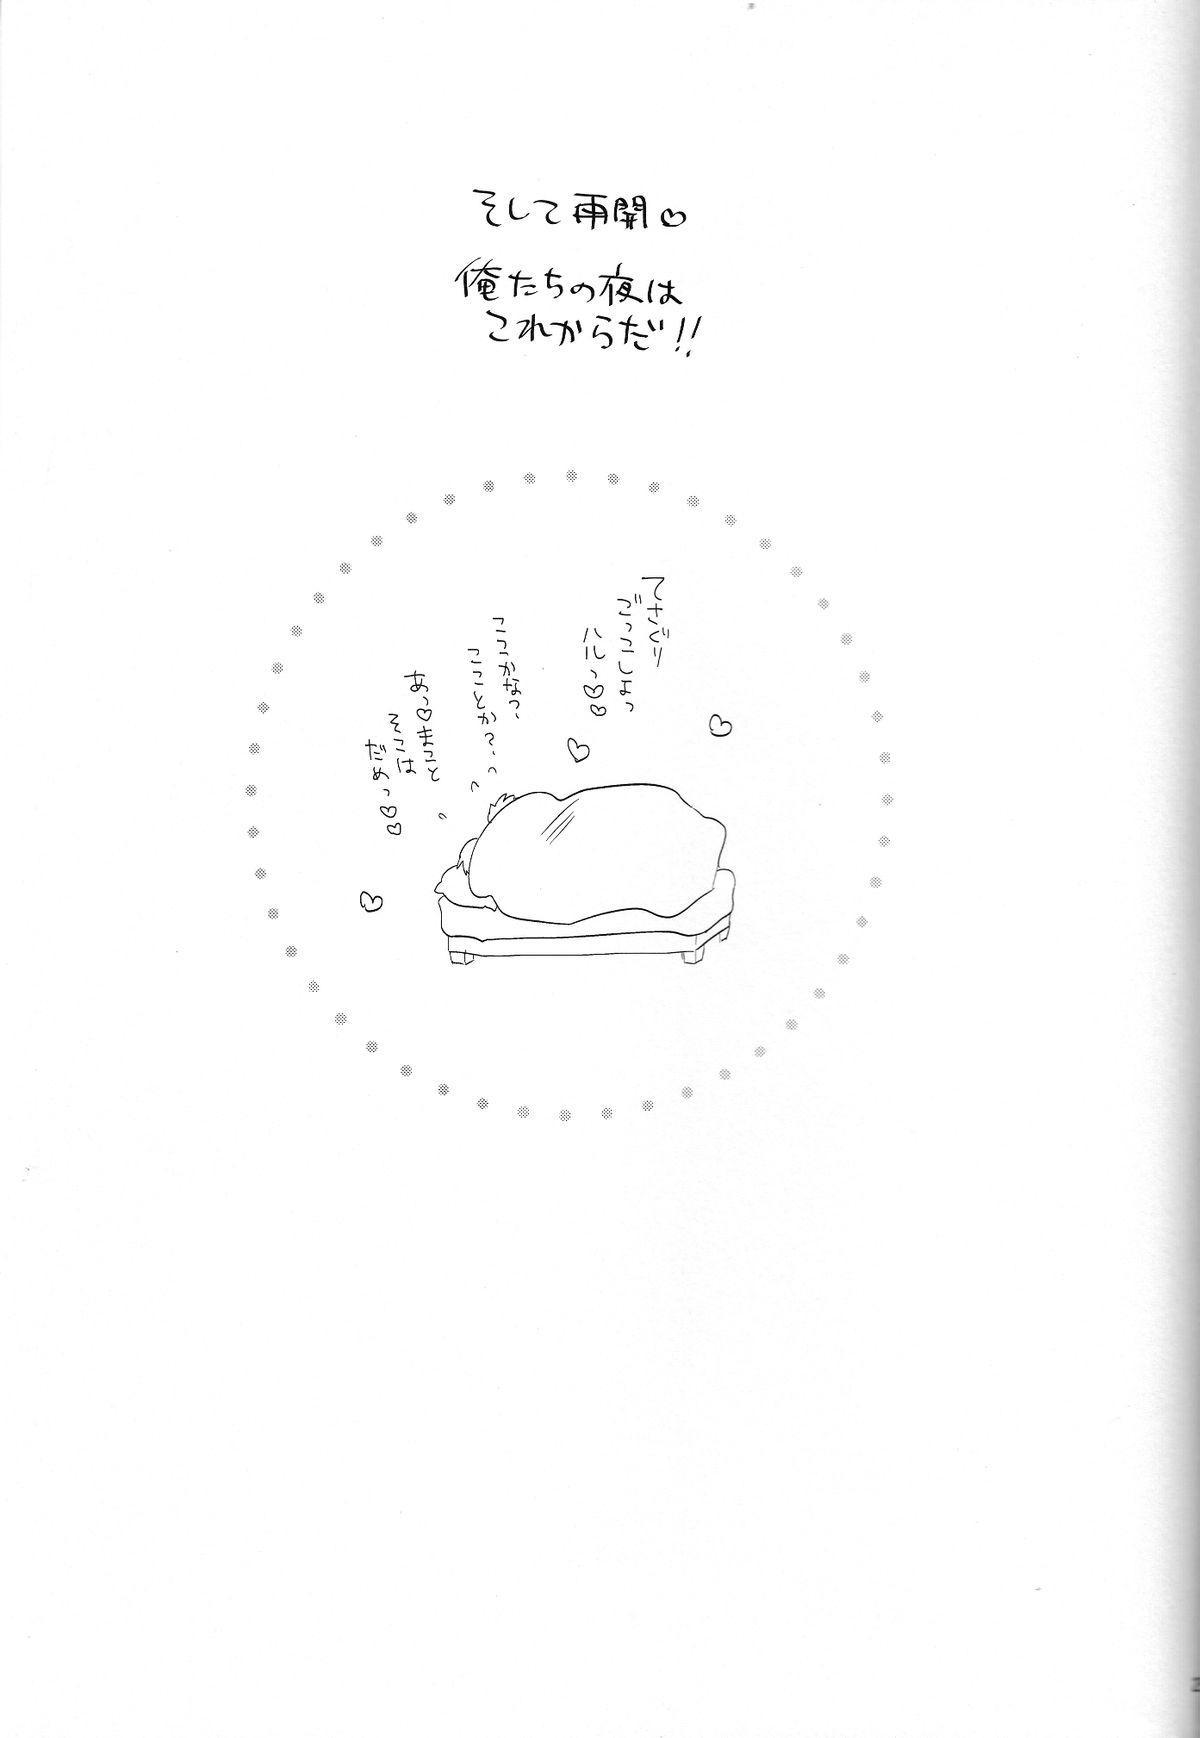 (Renai Endorphin 2) [Sneeeze (Kubu)] Cheer Haru-chan no Yuutsu | The Melancholy of Cheerleader Haru-chan (Free!) [English] {Anneioux} 23